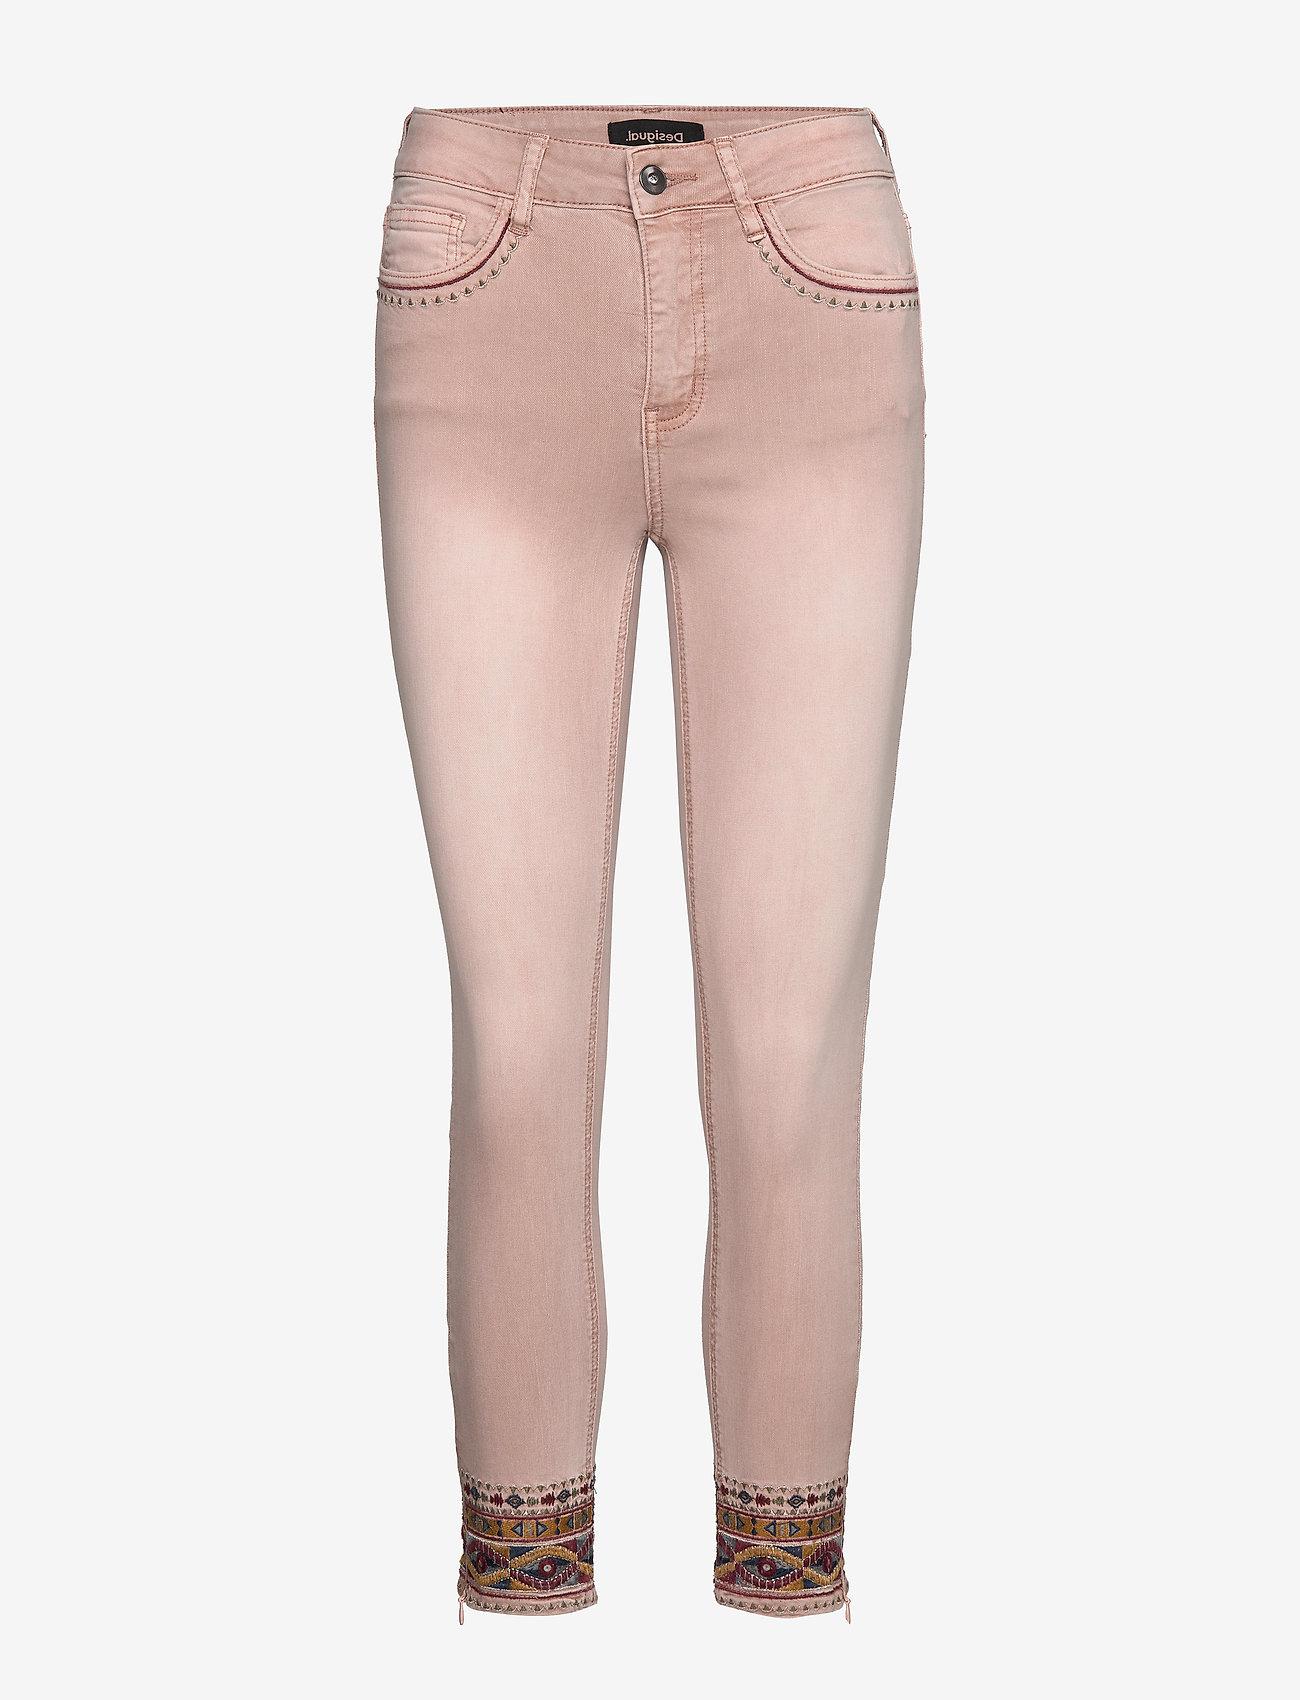 Desigual - PANT AFRI - slim jeans - rosa palo - 0